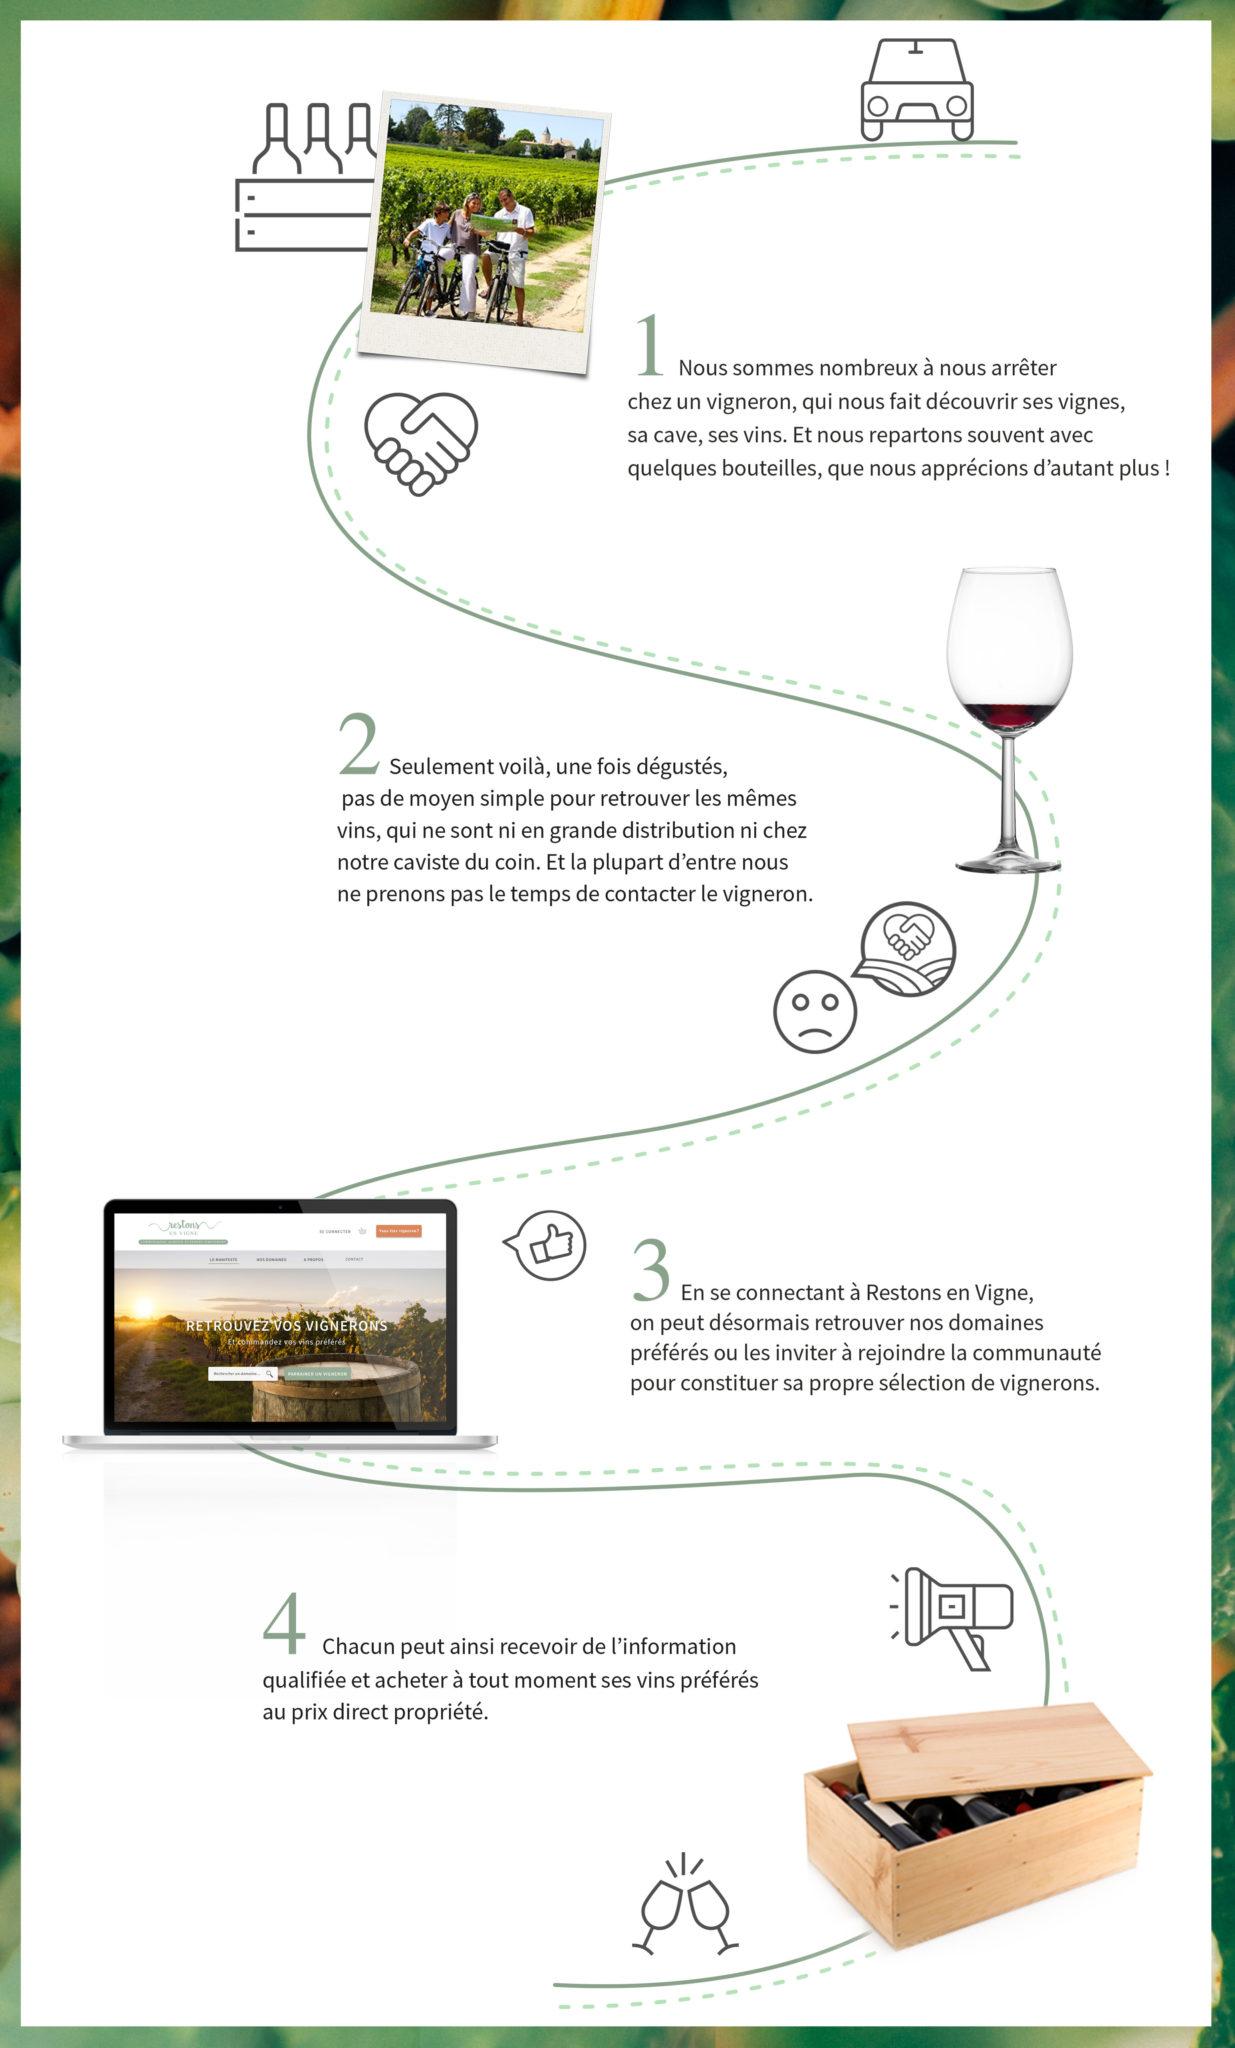 Restons en Vigne : l'outil à adopter !